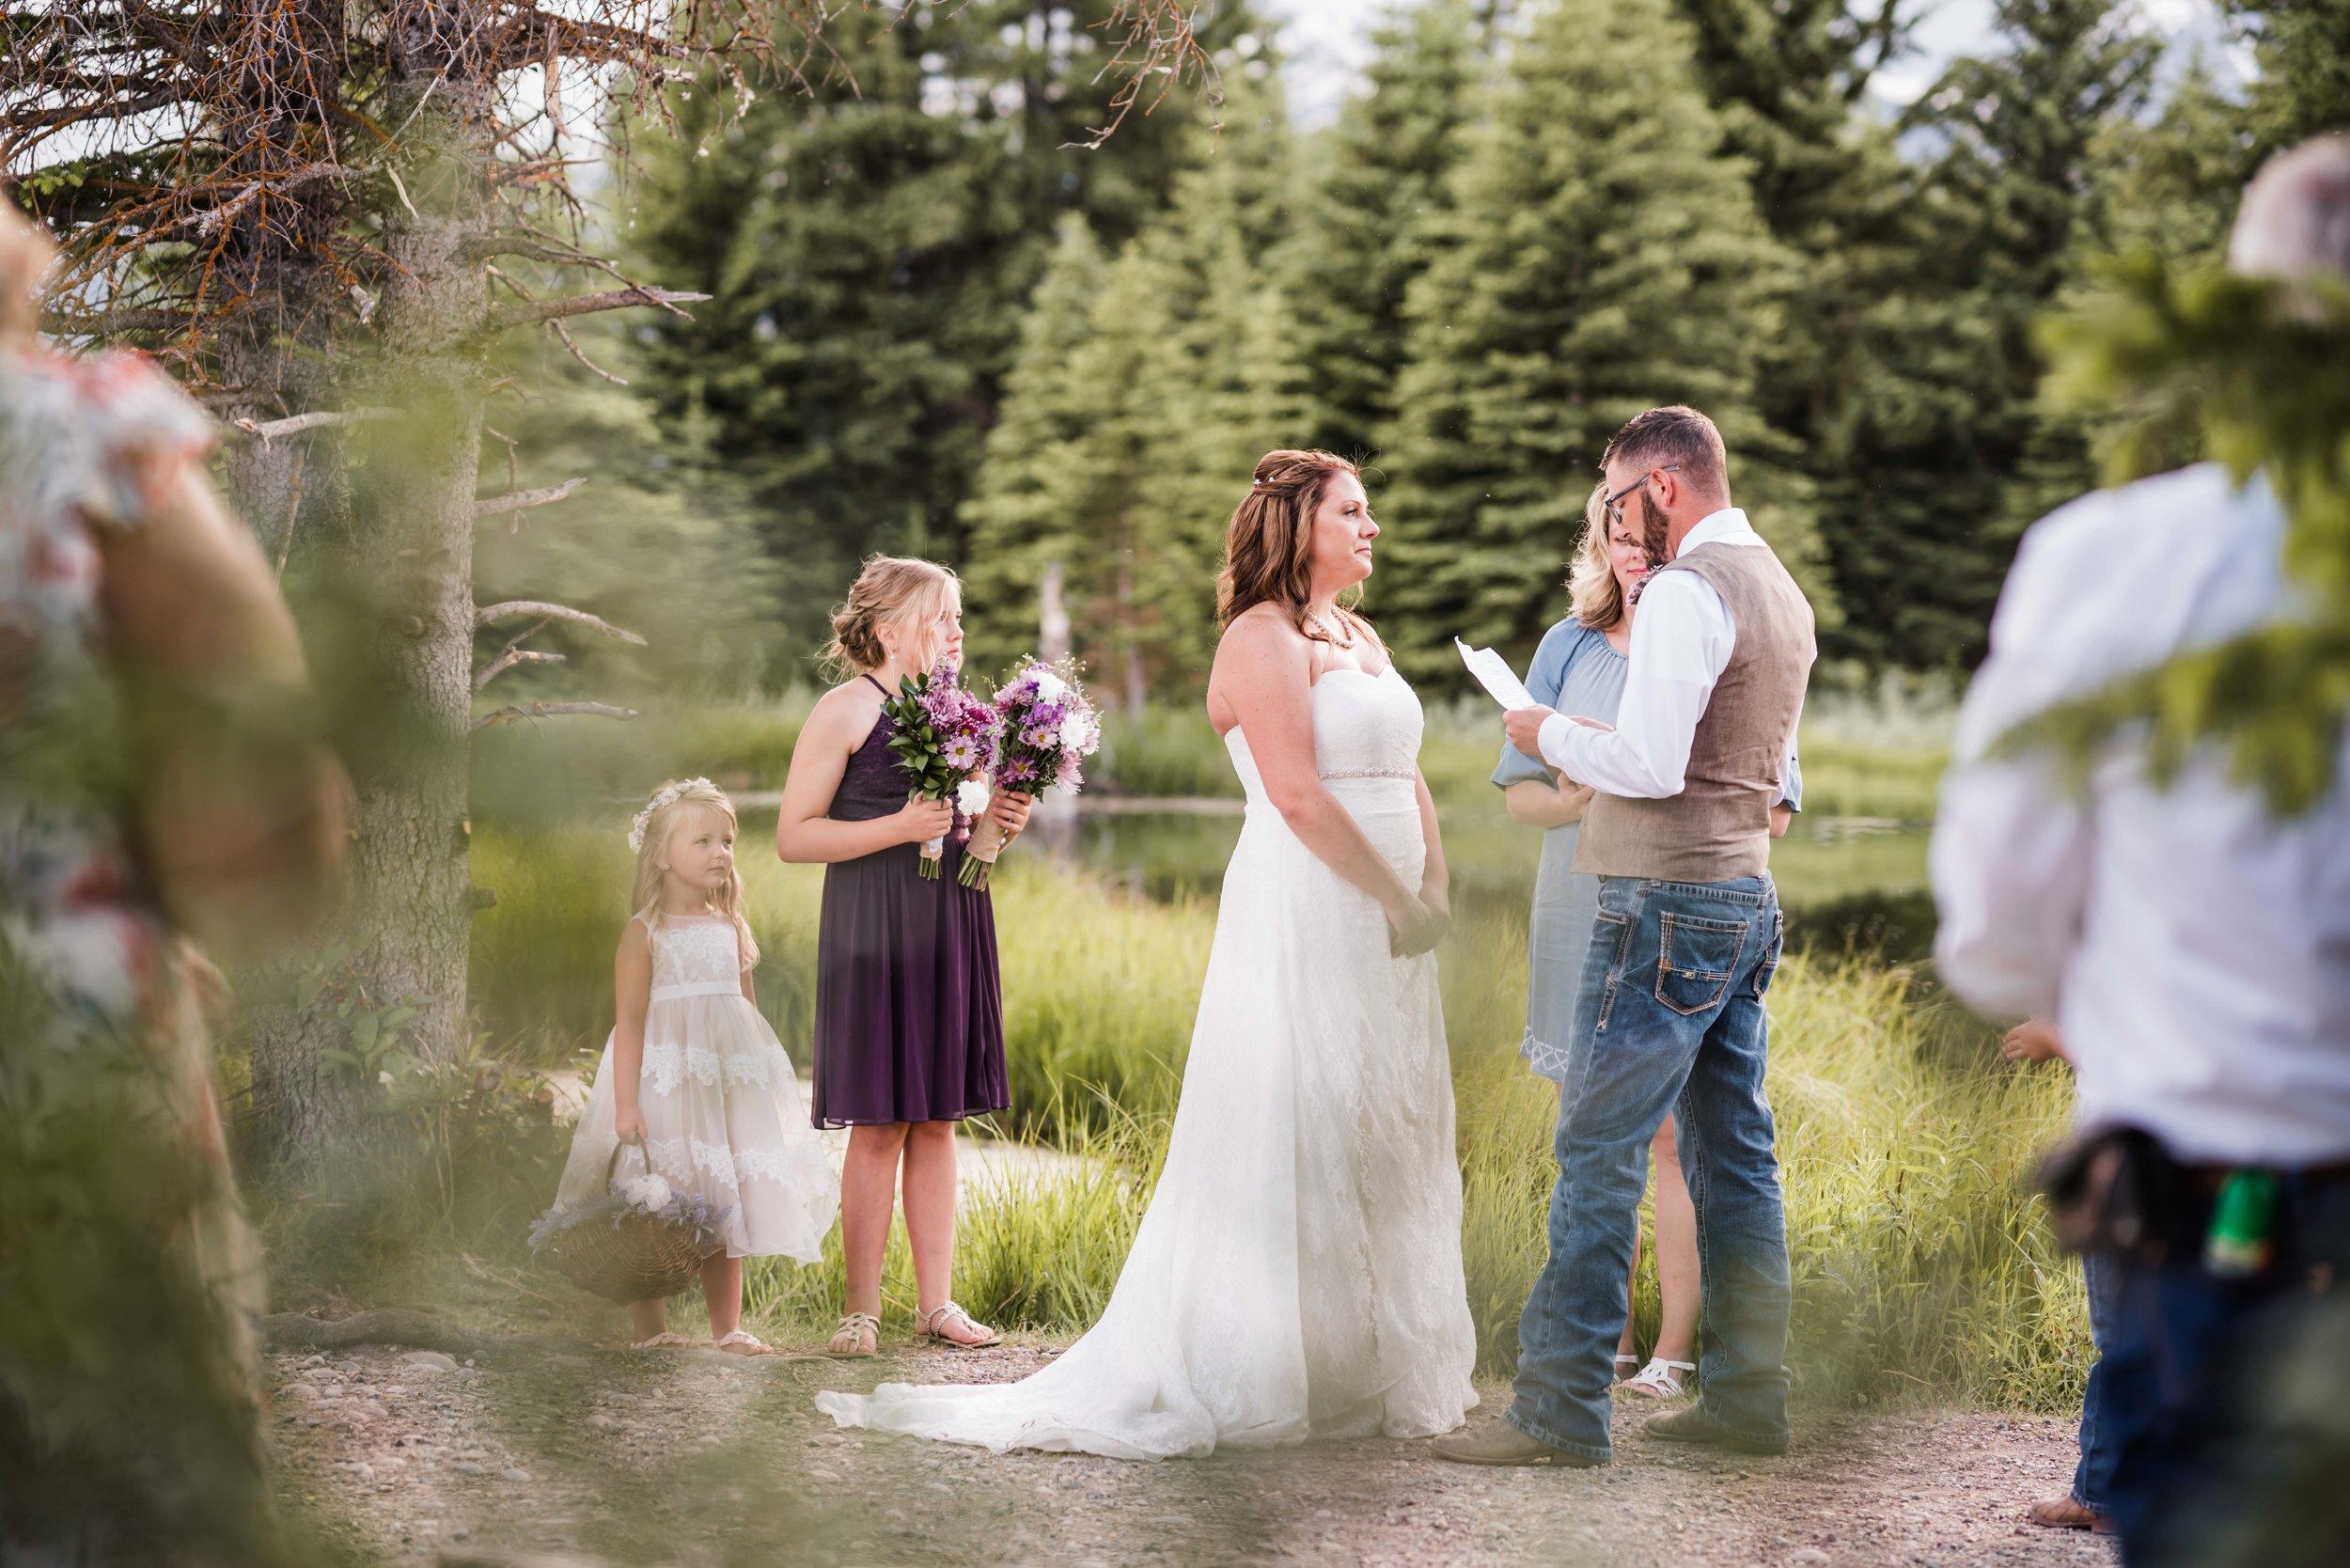 jackson hole adventure wedding photography at schwabachers landing in GTNP -DSC03814.jpg